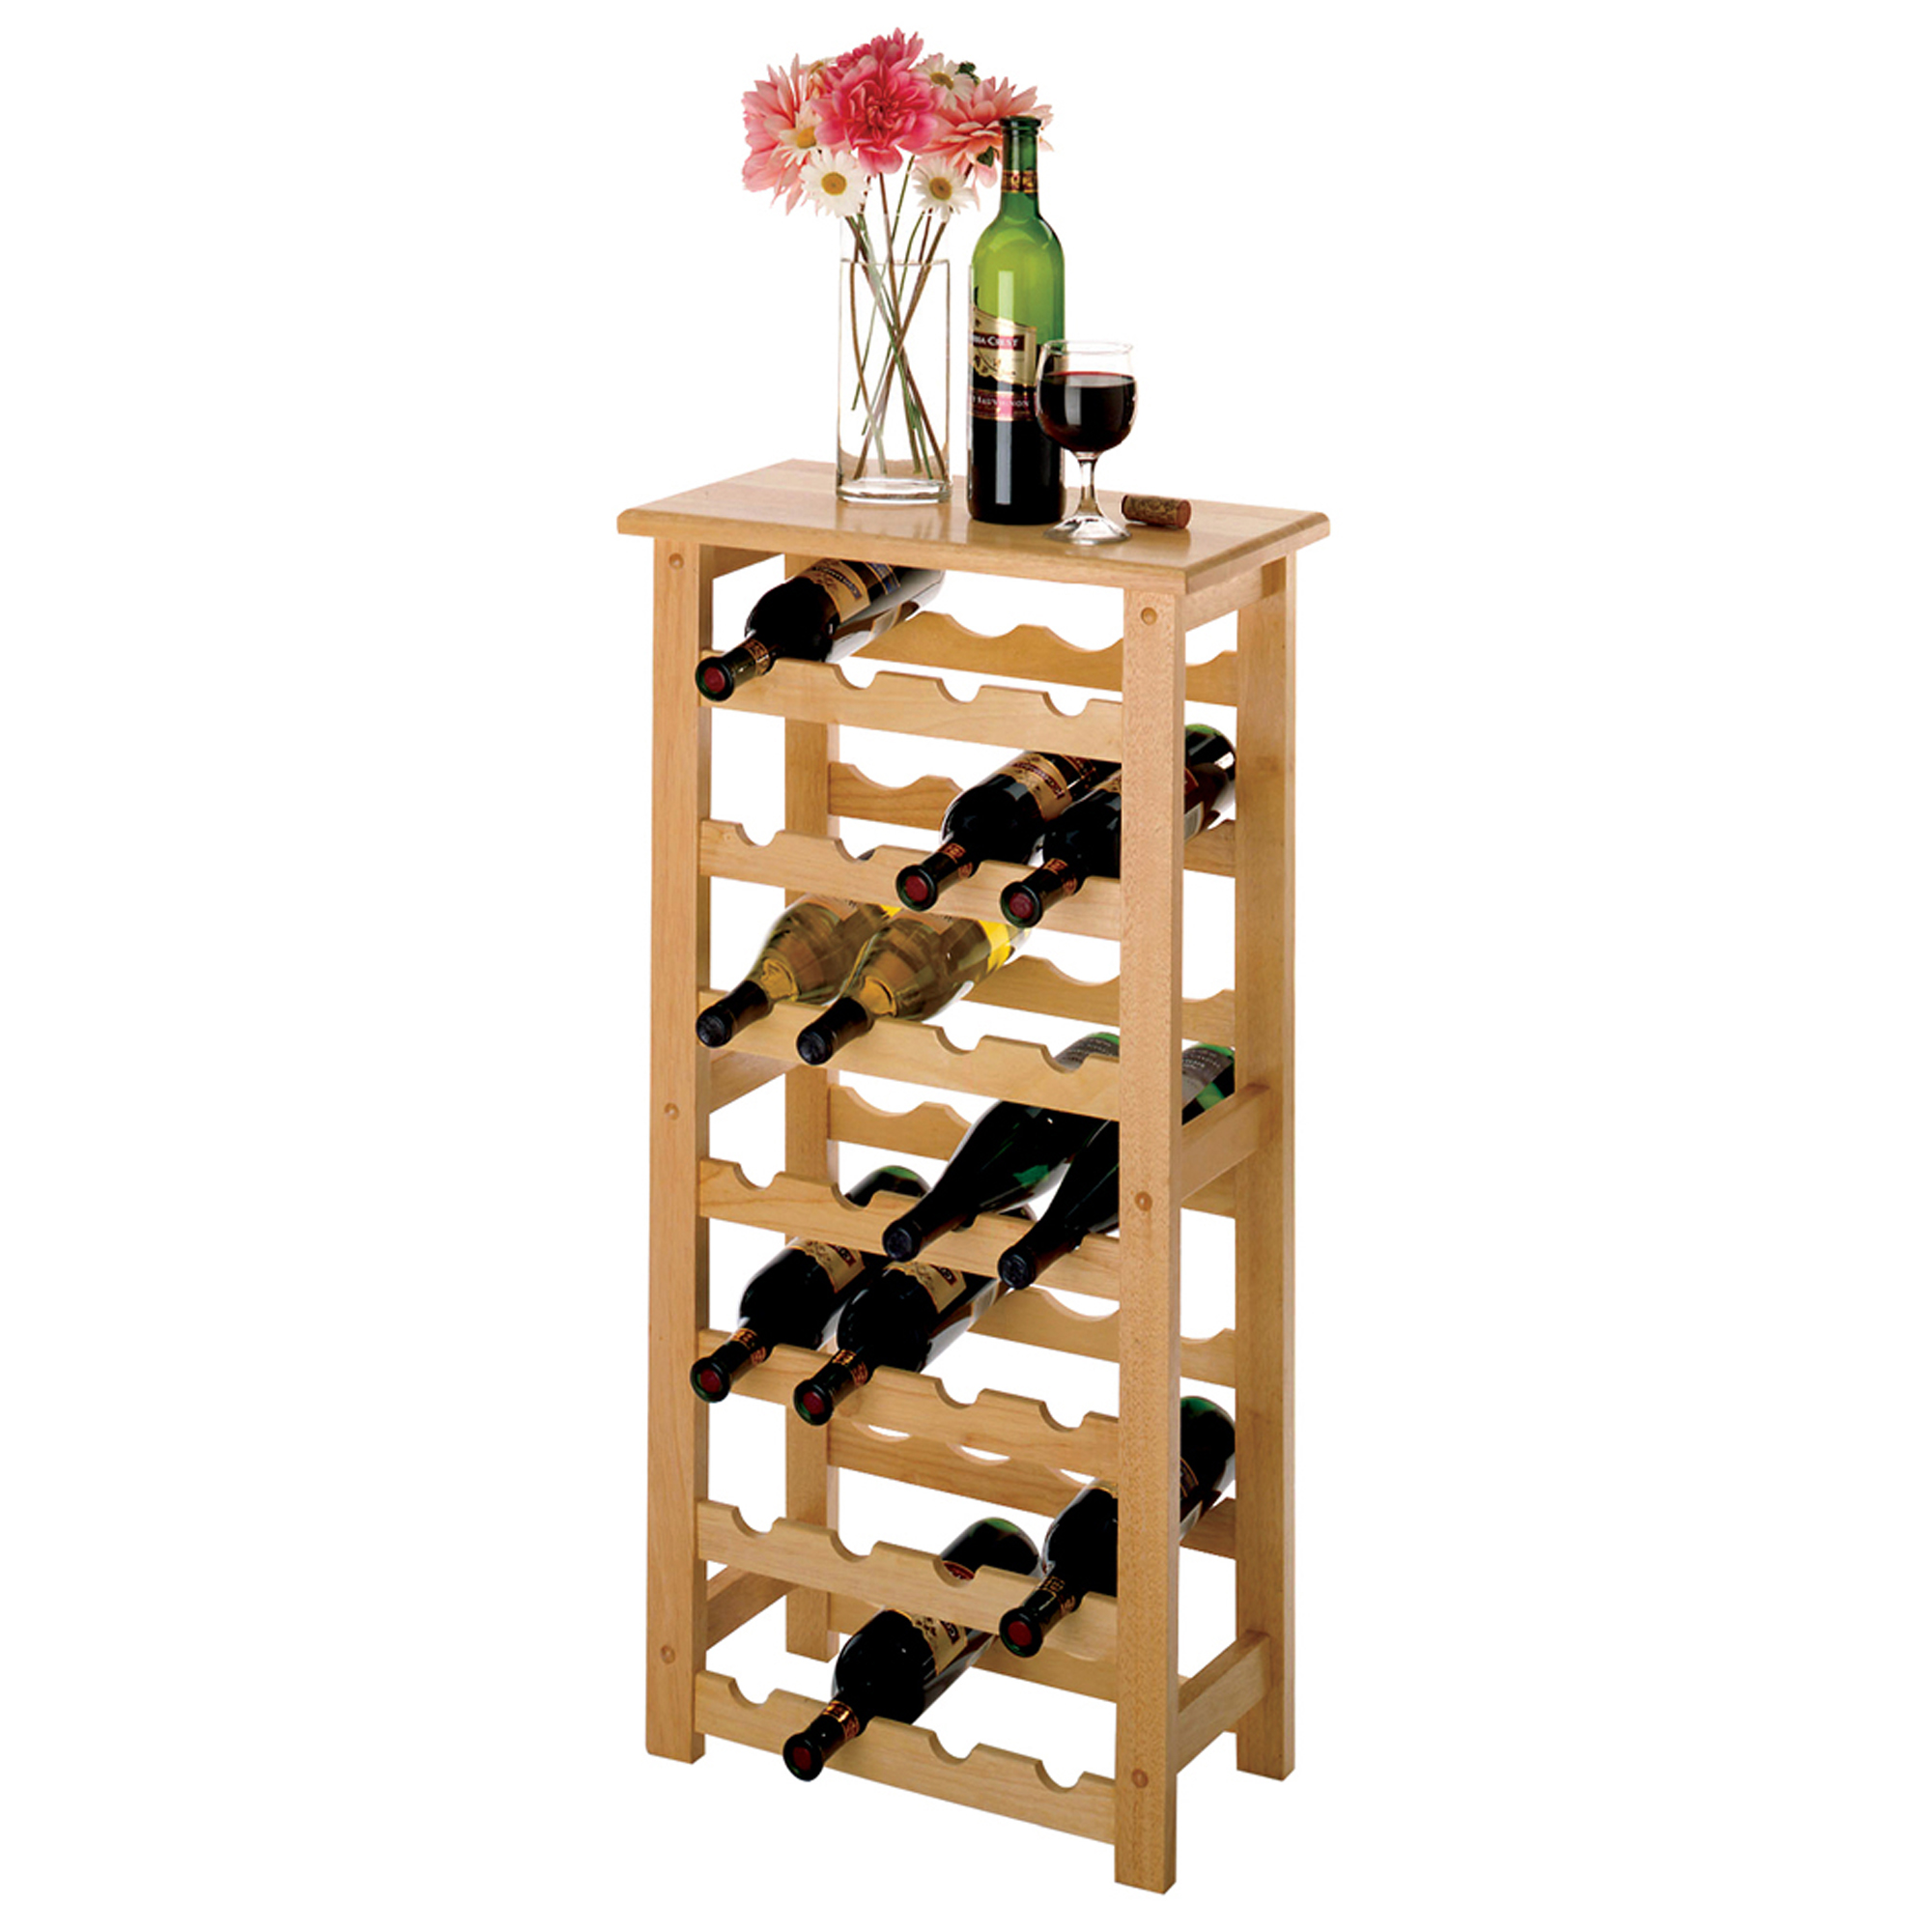 Winsome Wood Napa 28-Bottle Compact Sized Wine Rack, Natural Finish